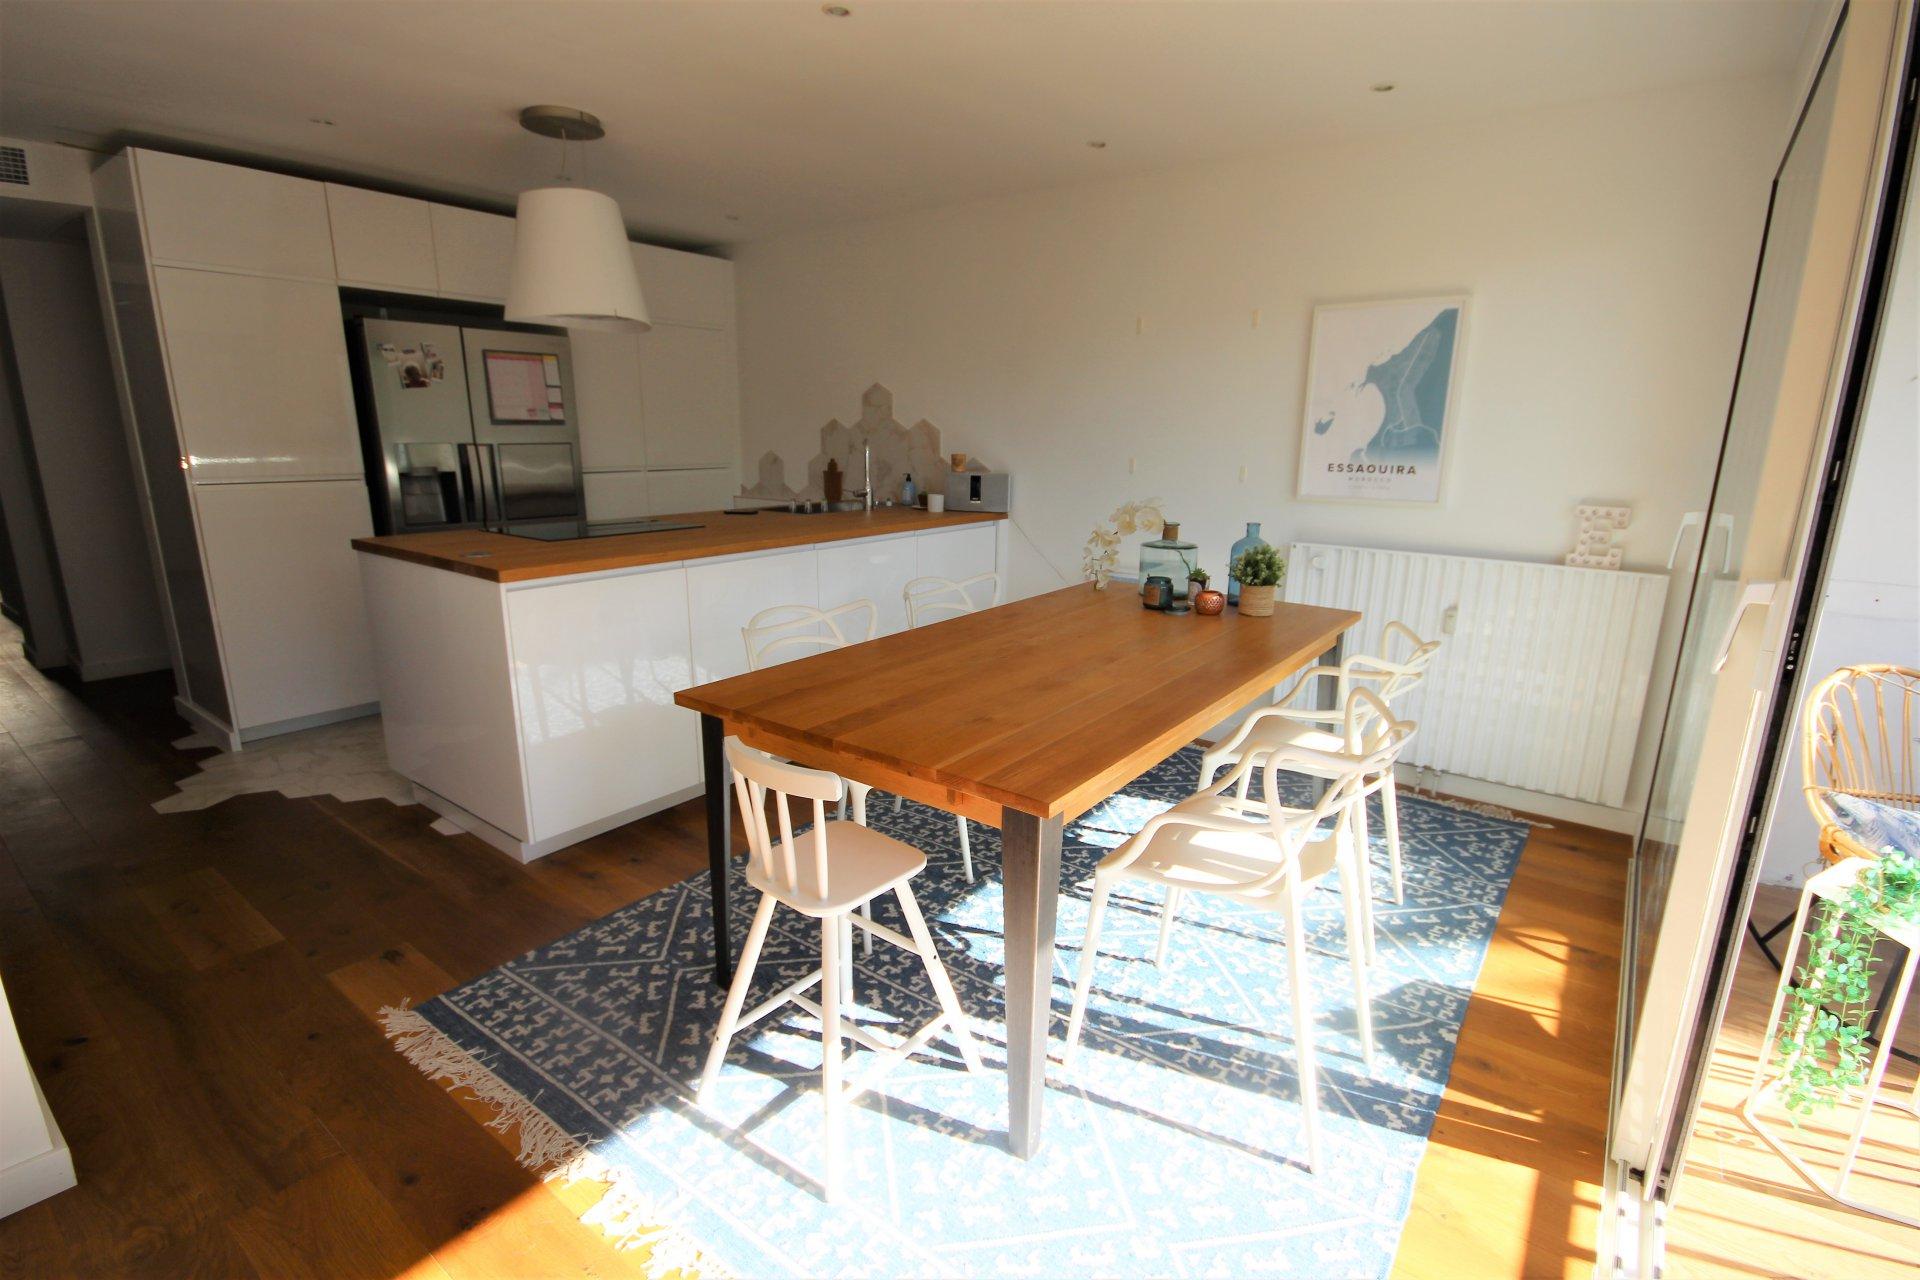 Apartment 3/4p renovated